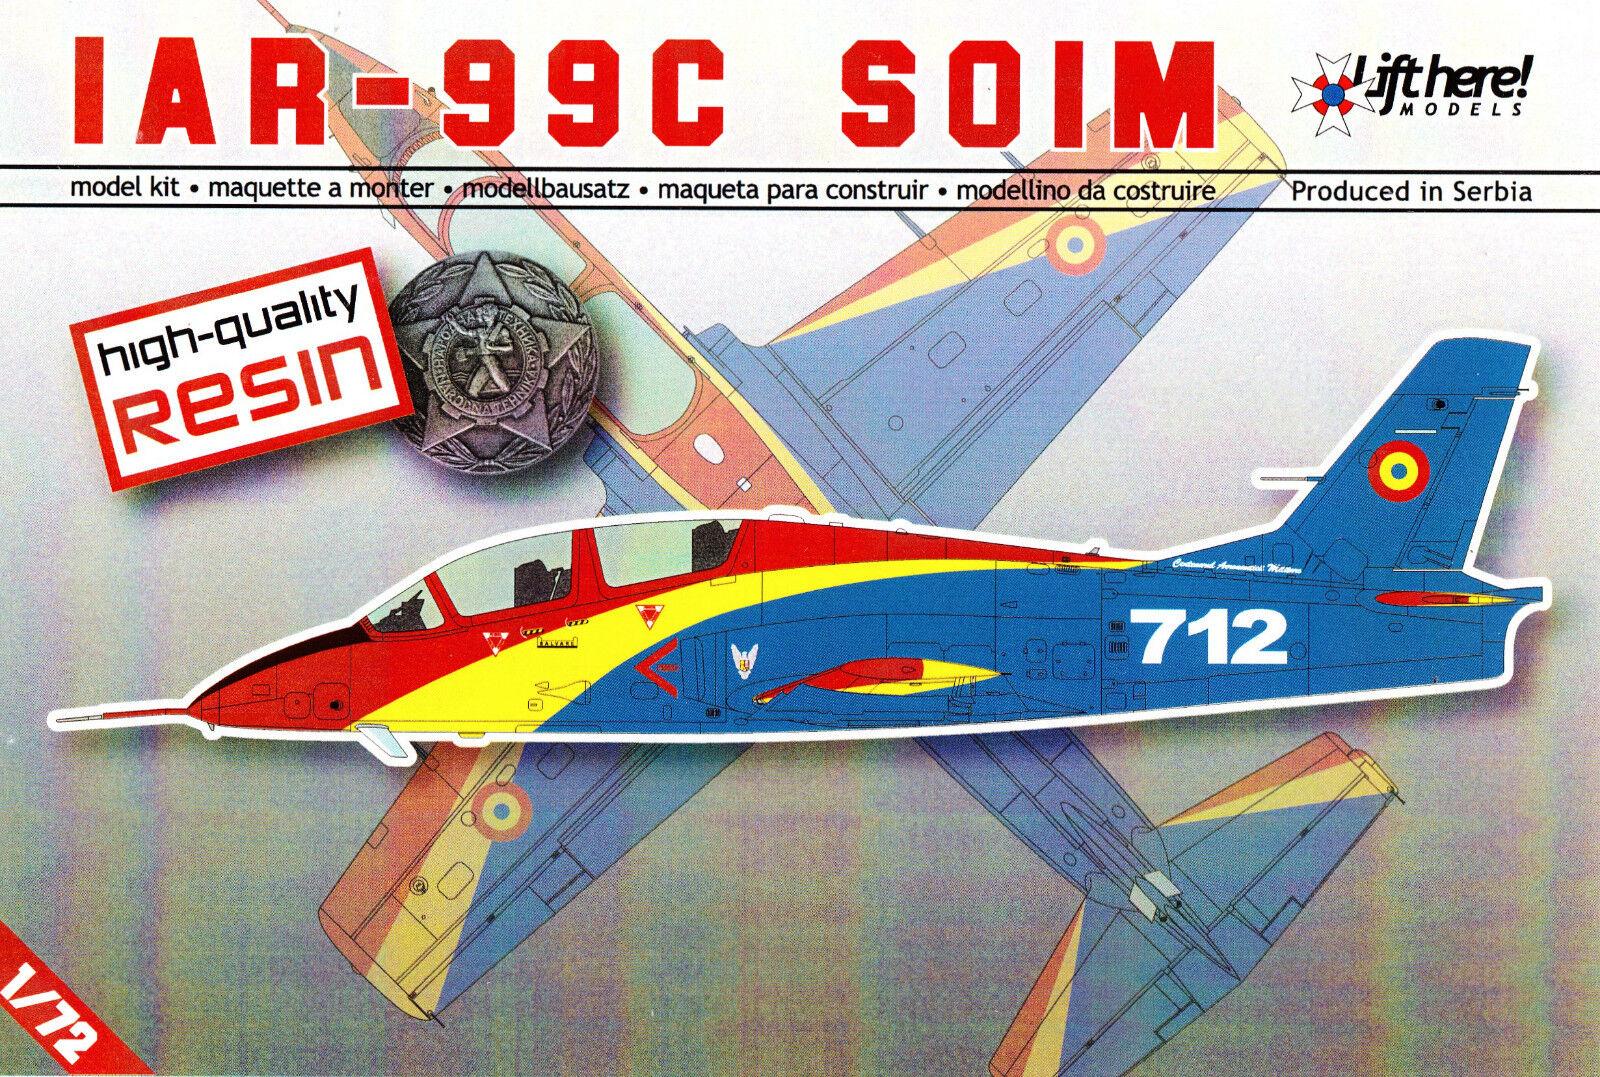 Lhm031  Lift Here Models - IAR-99C  Soim  - Resin - 1 72 - RARITÄT